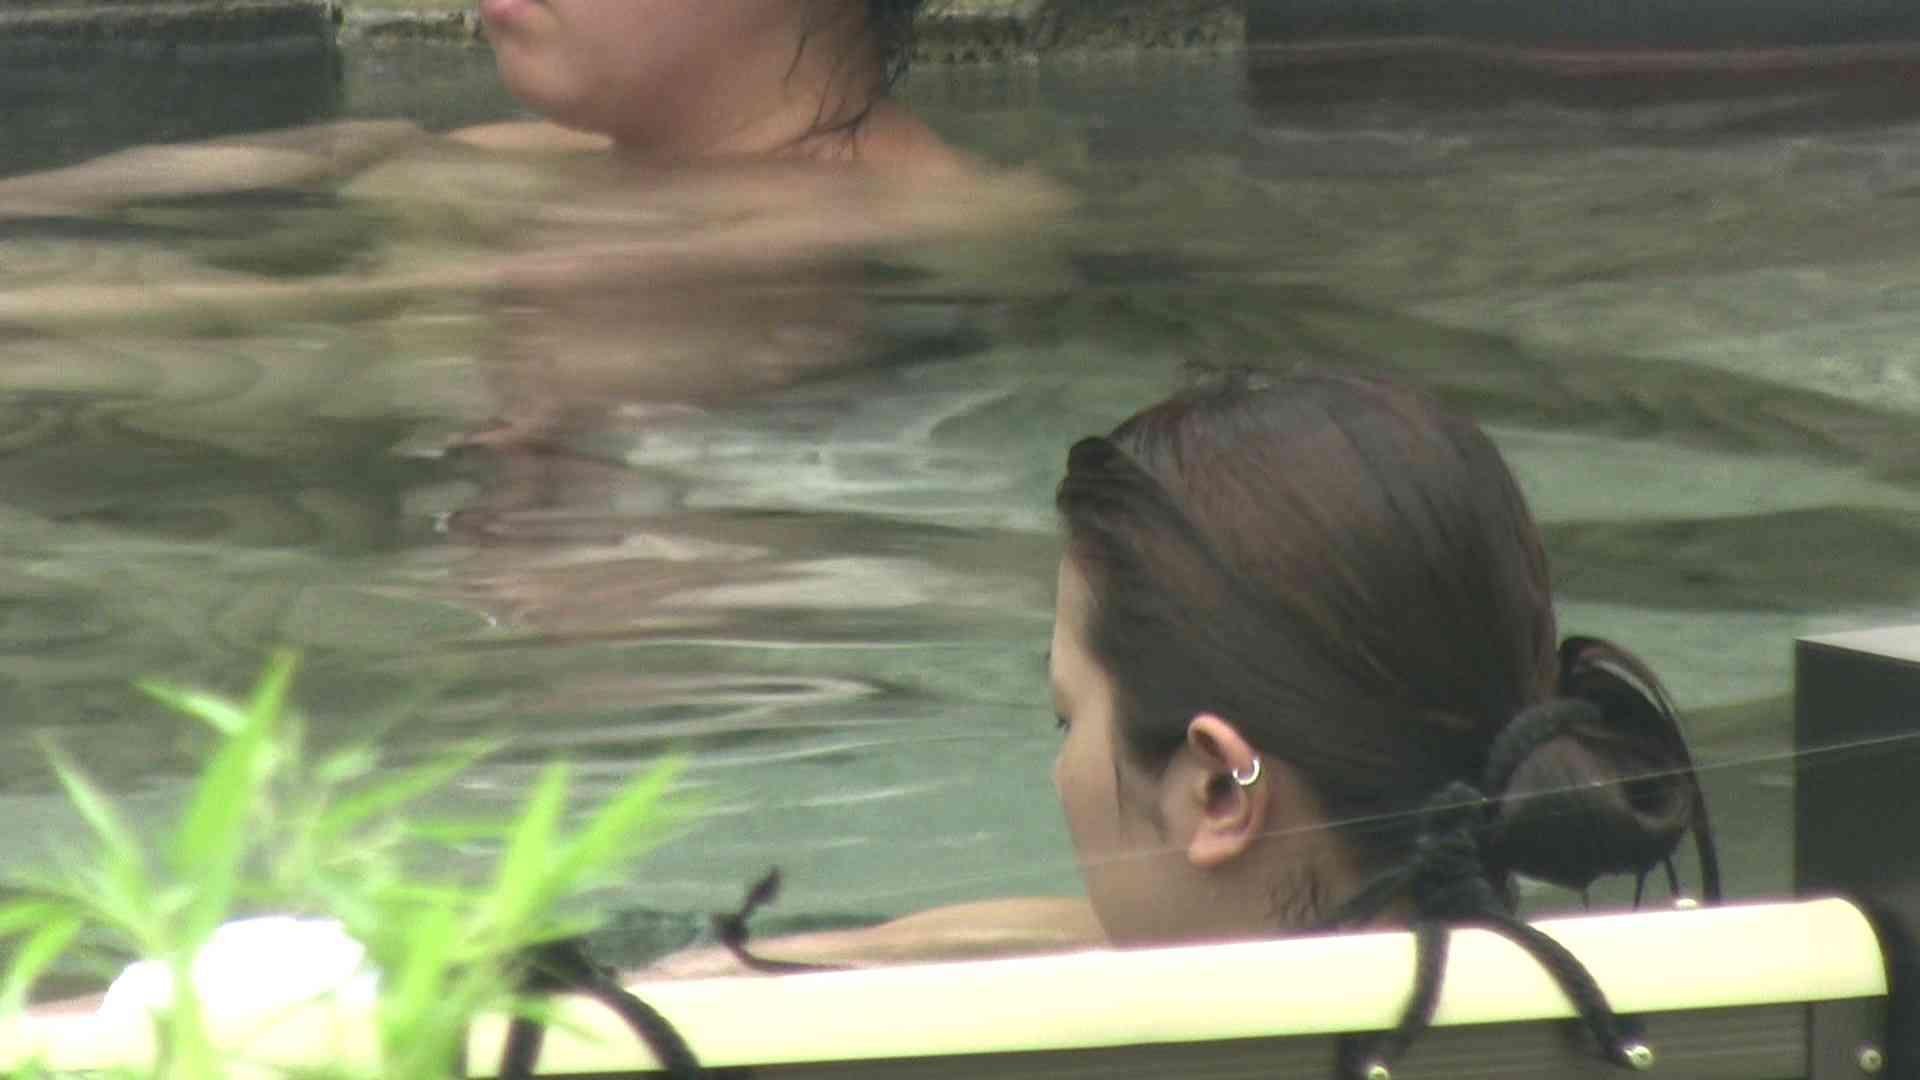 Aquaな露天風呂Vol.19【VIP】 盗撮 | HなOL  88pic 84